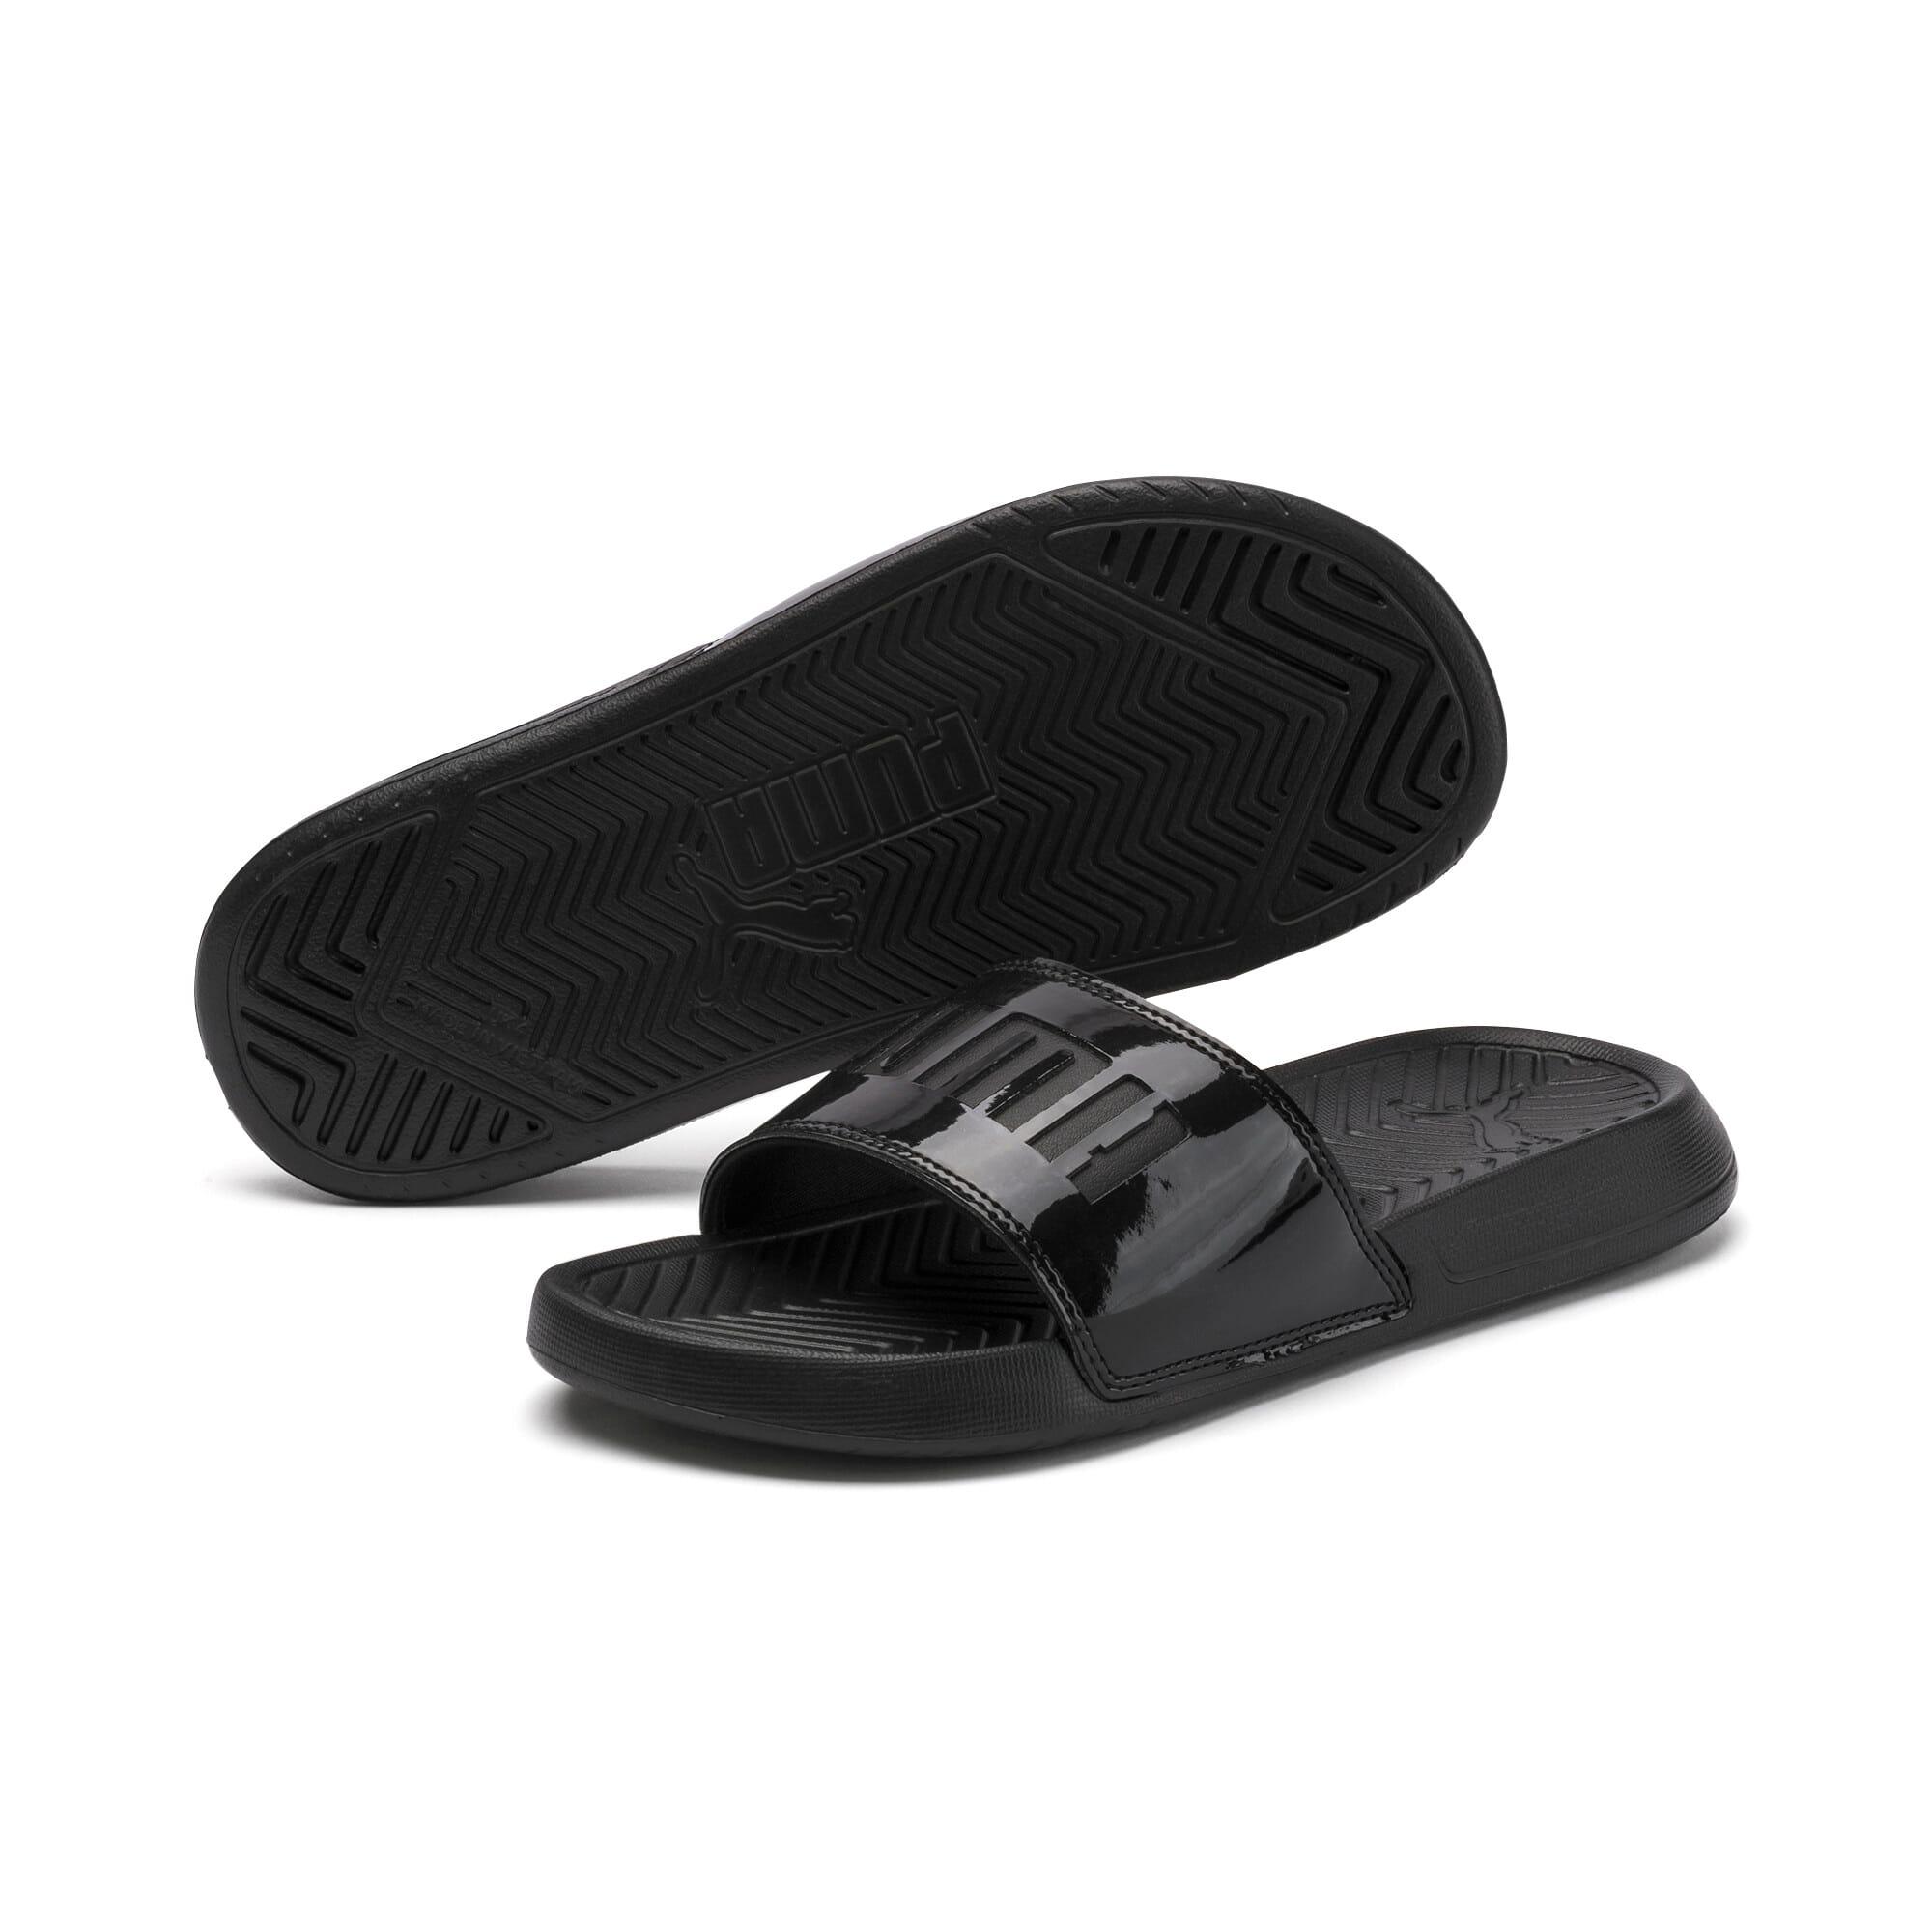 Thumbnail 2 of Popcat Patent Women's Sandals, Puma Black-Puma Black, medium